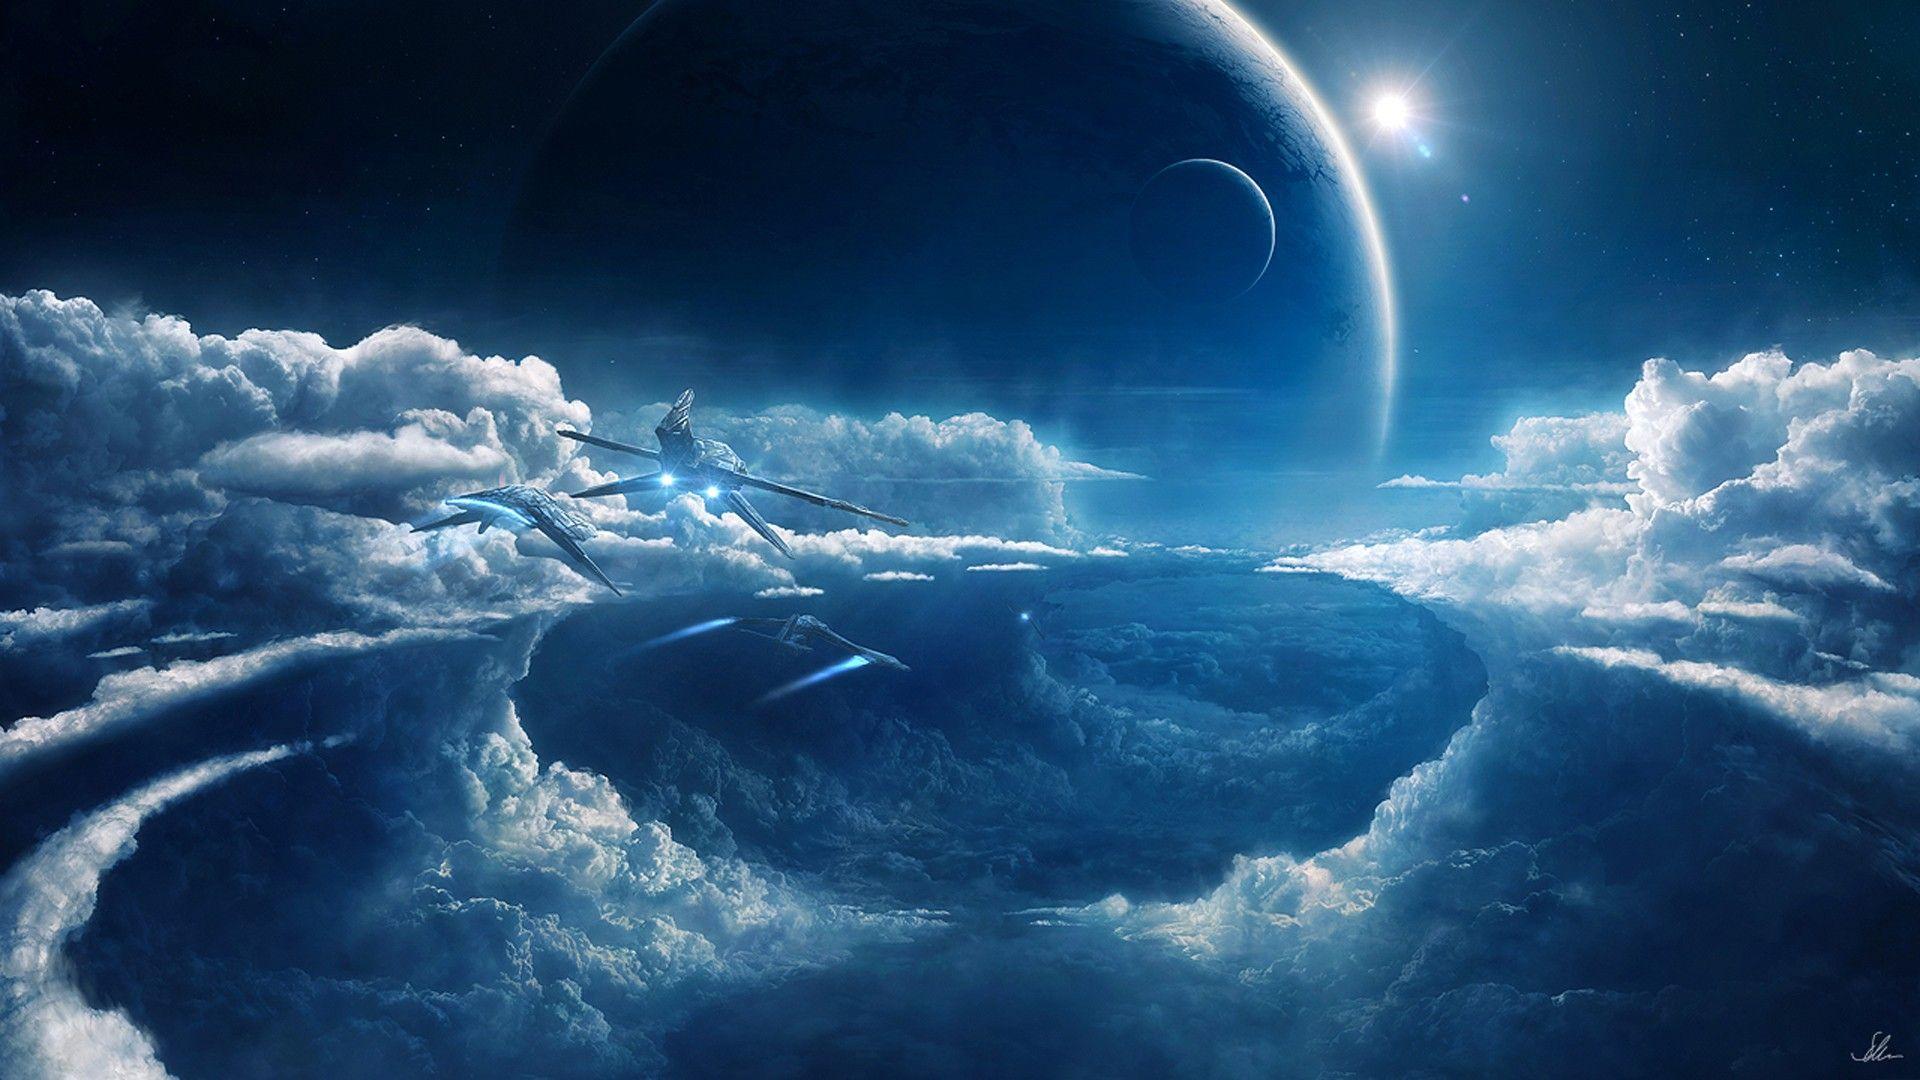 Prometheus Outer Space Planets Wallpaper 2555822 Wallbase Cc Sci Fi Wallpaper Fantasy Landscape Futuristic Art